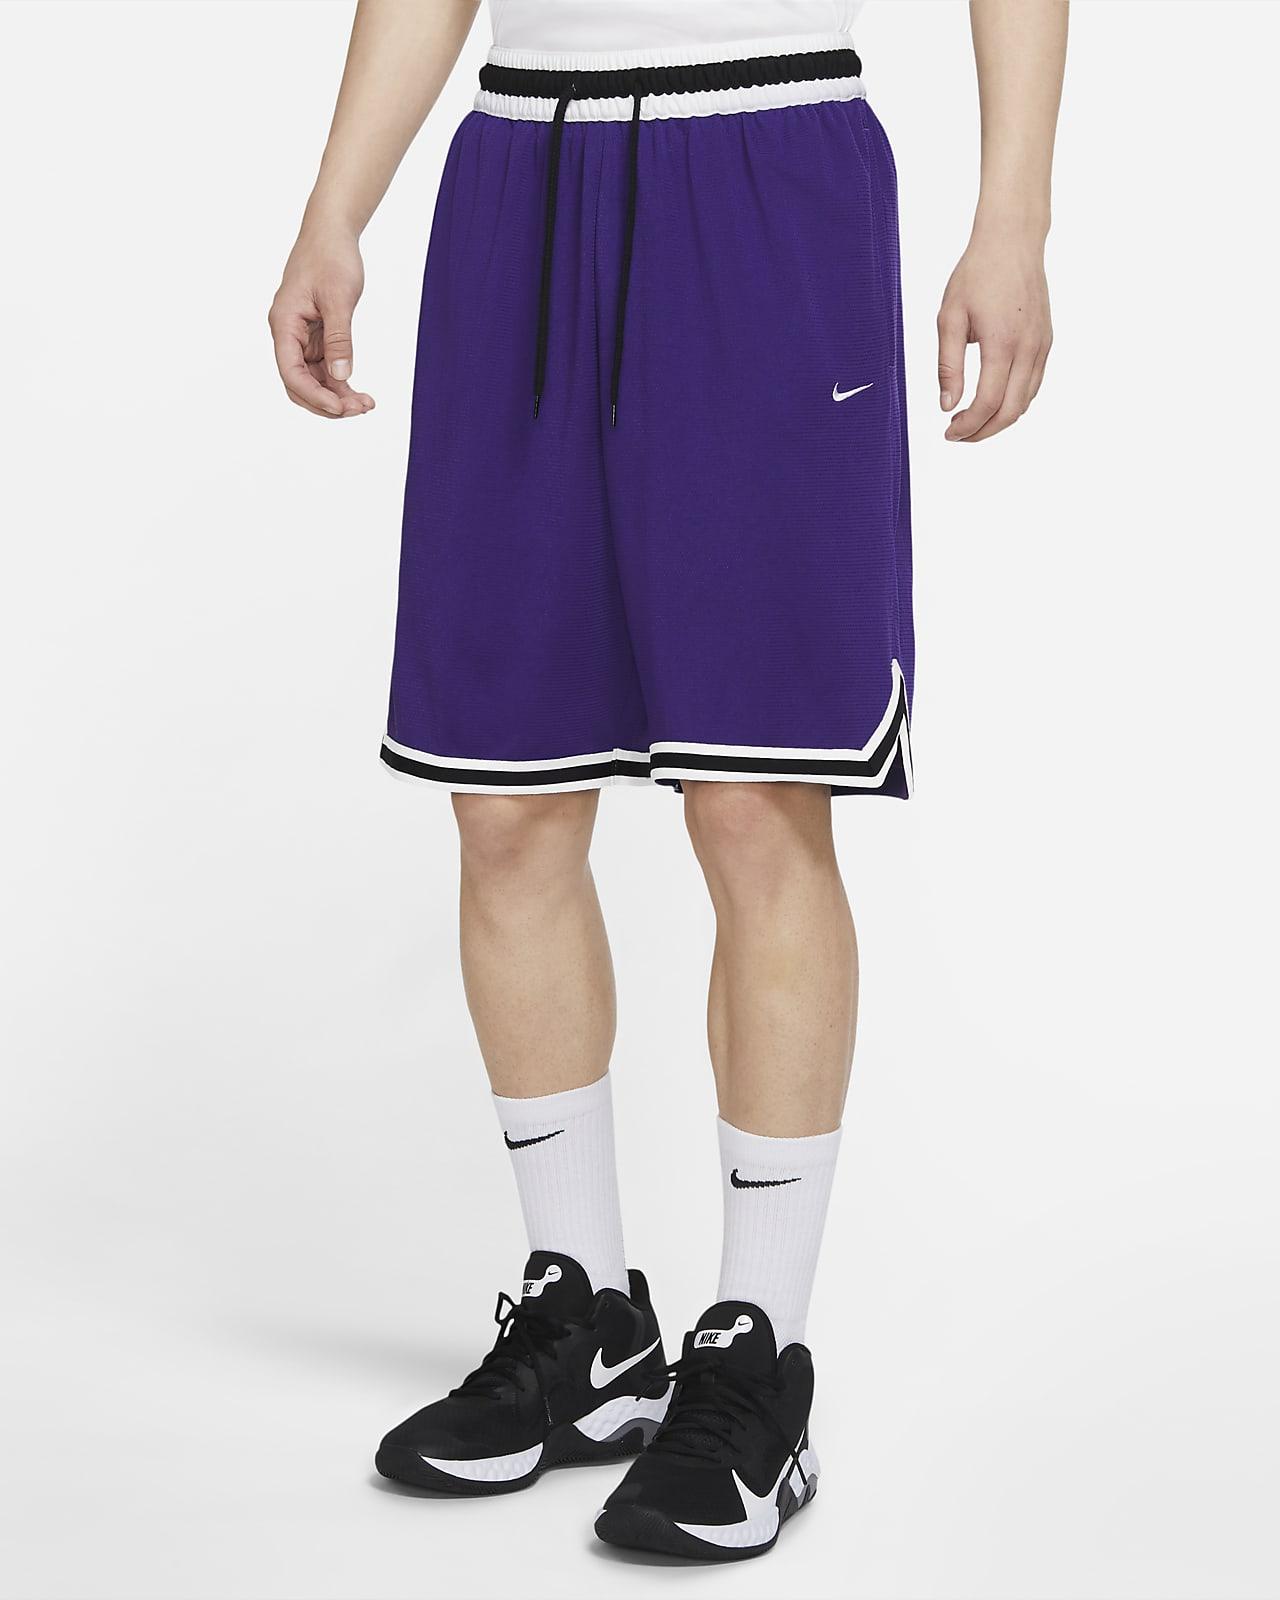 Nike Dri-FIT DNA 3.0 Men's Basketball Shorts